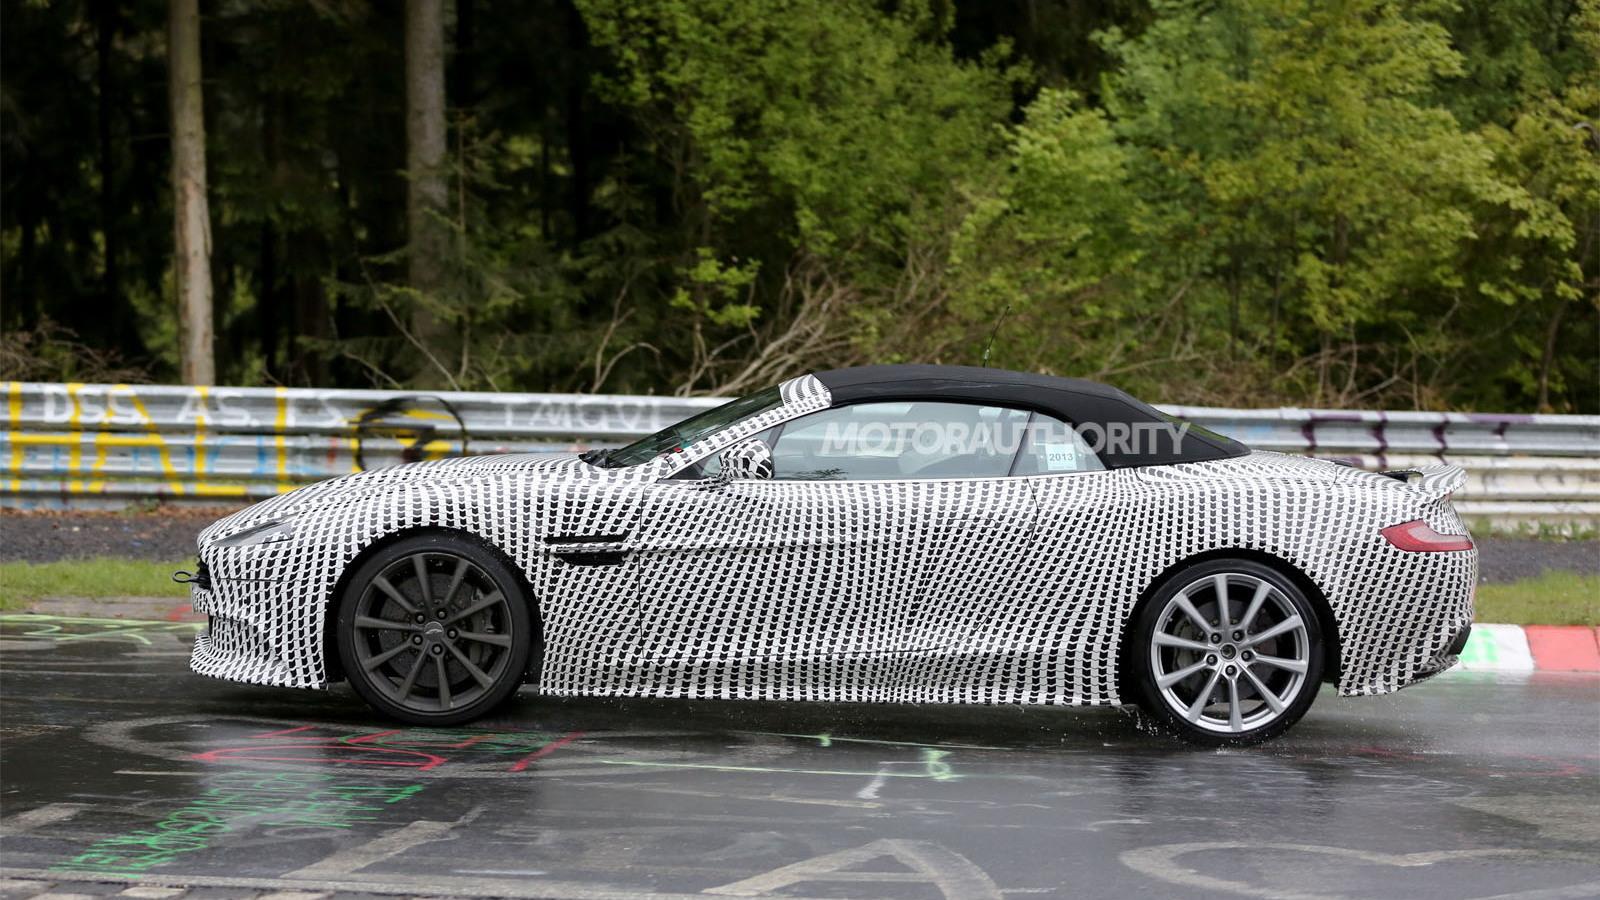 2014 Aston Martin Vanquish Volante spy shots